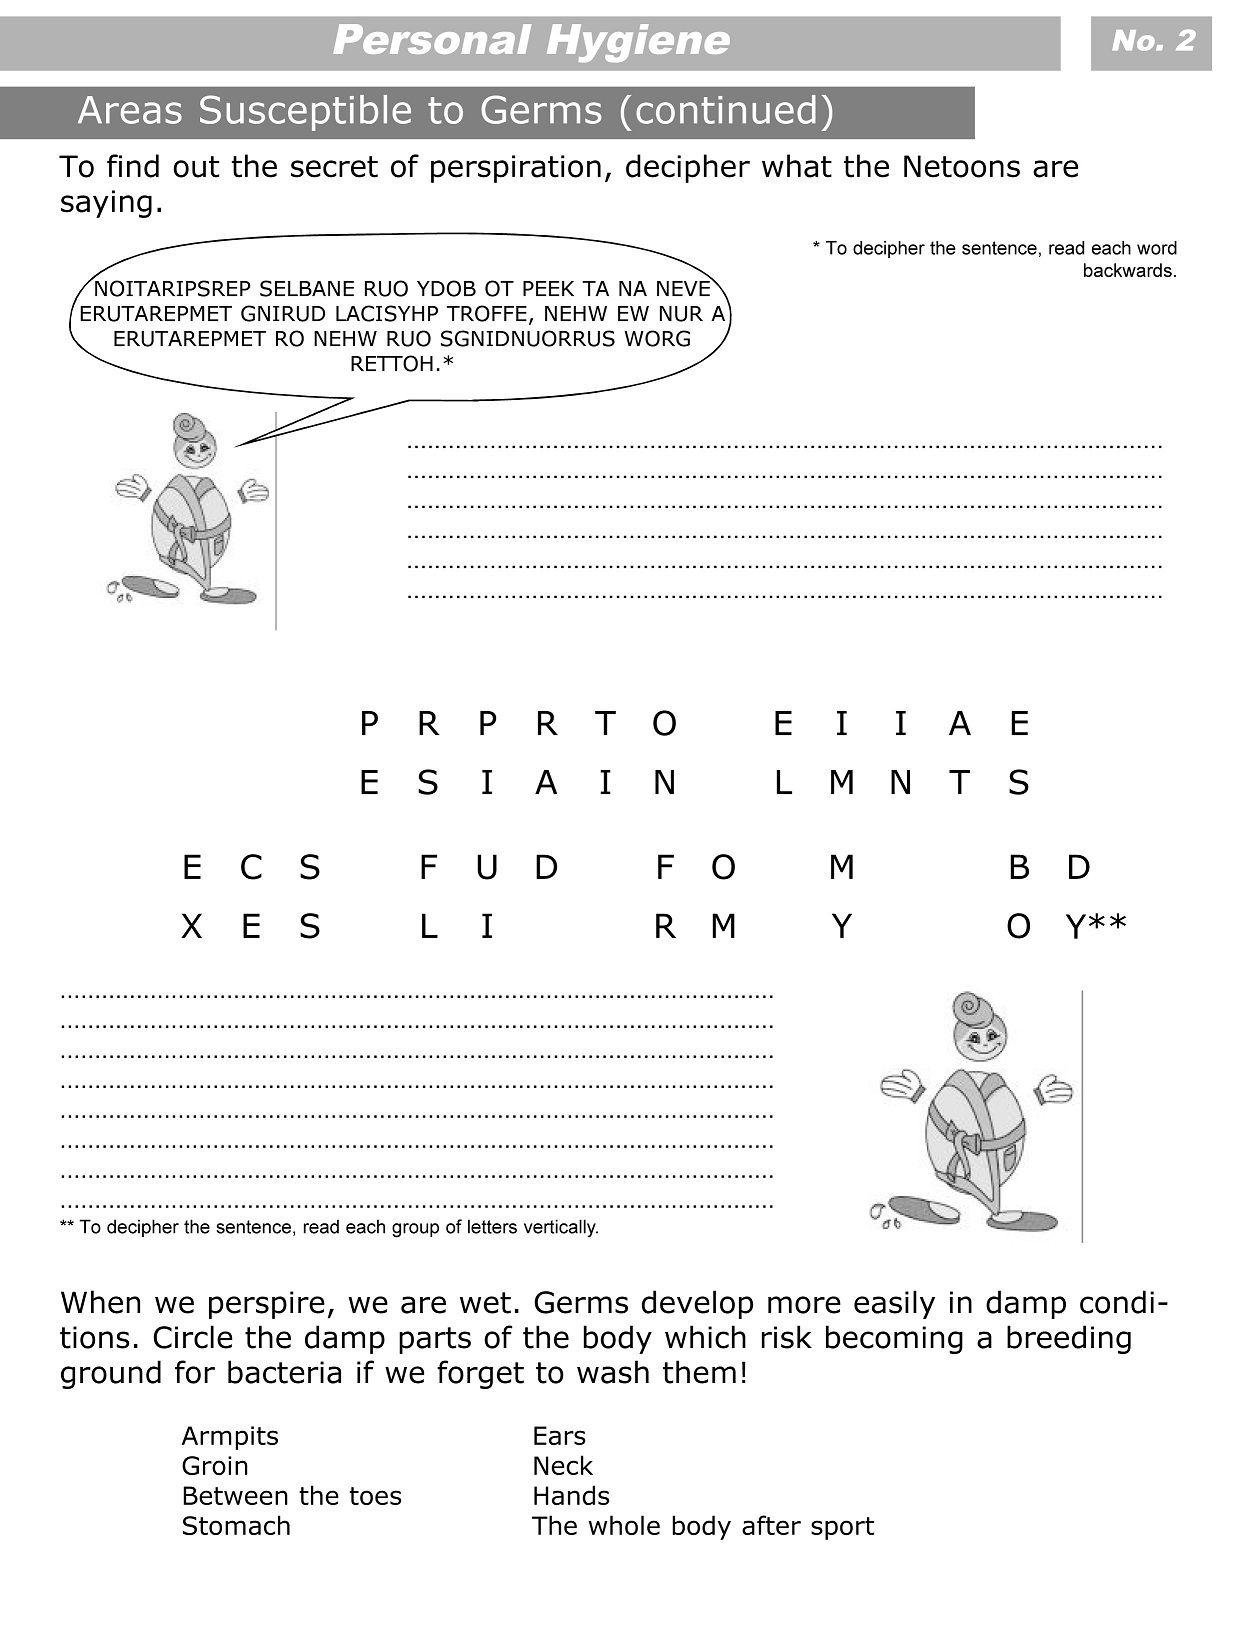 Personal Hygiene Worksheets For Kids Level 3 2 | Girls Guards - Free Printable Personal Hygiene Worksheets